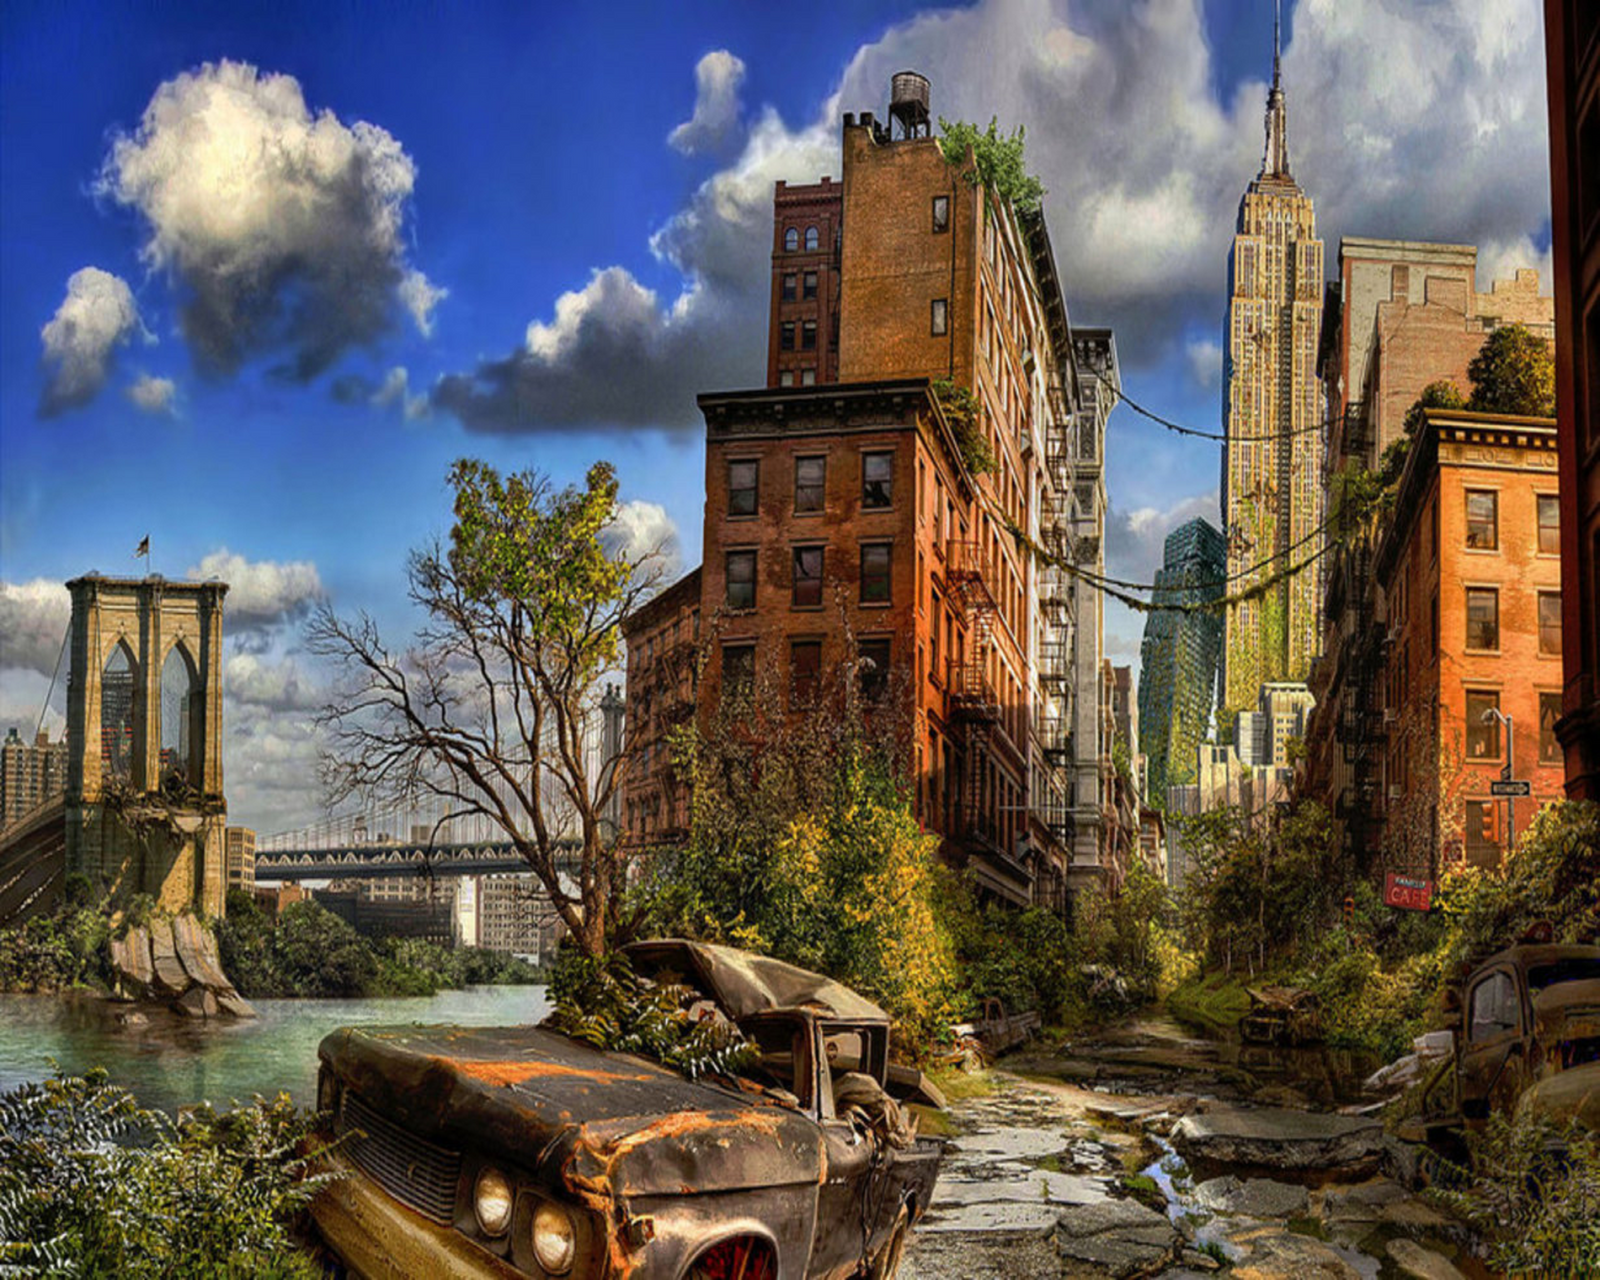 Post Apocalypse New York City by myjavier007 on DeviantArt